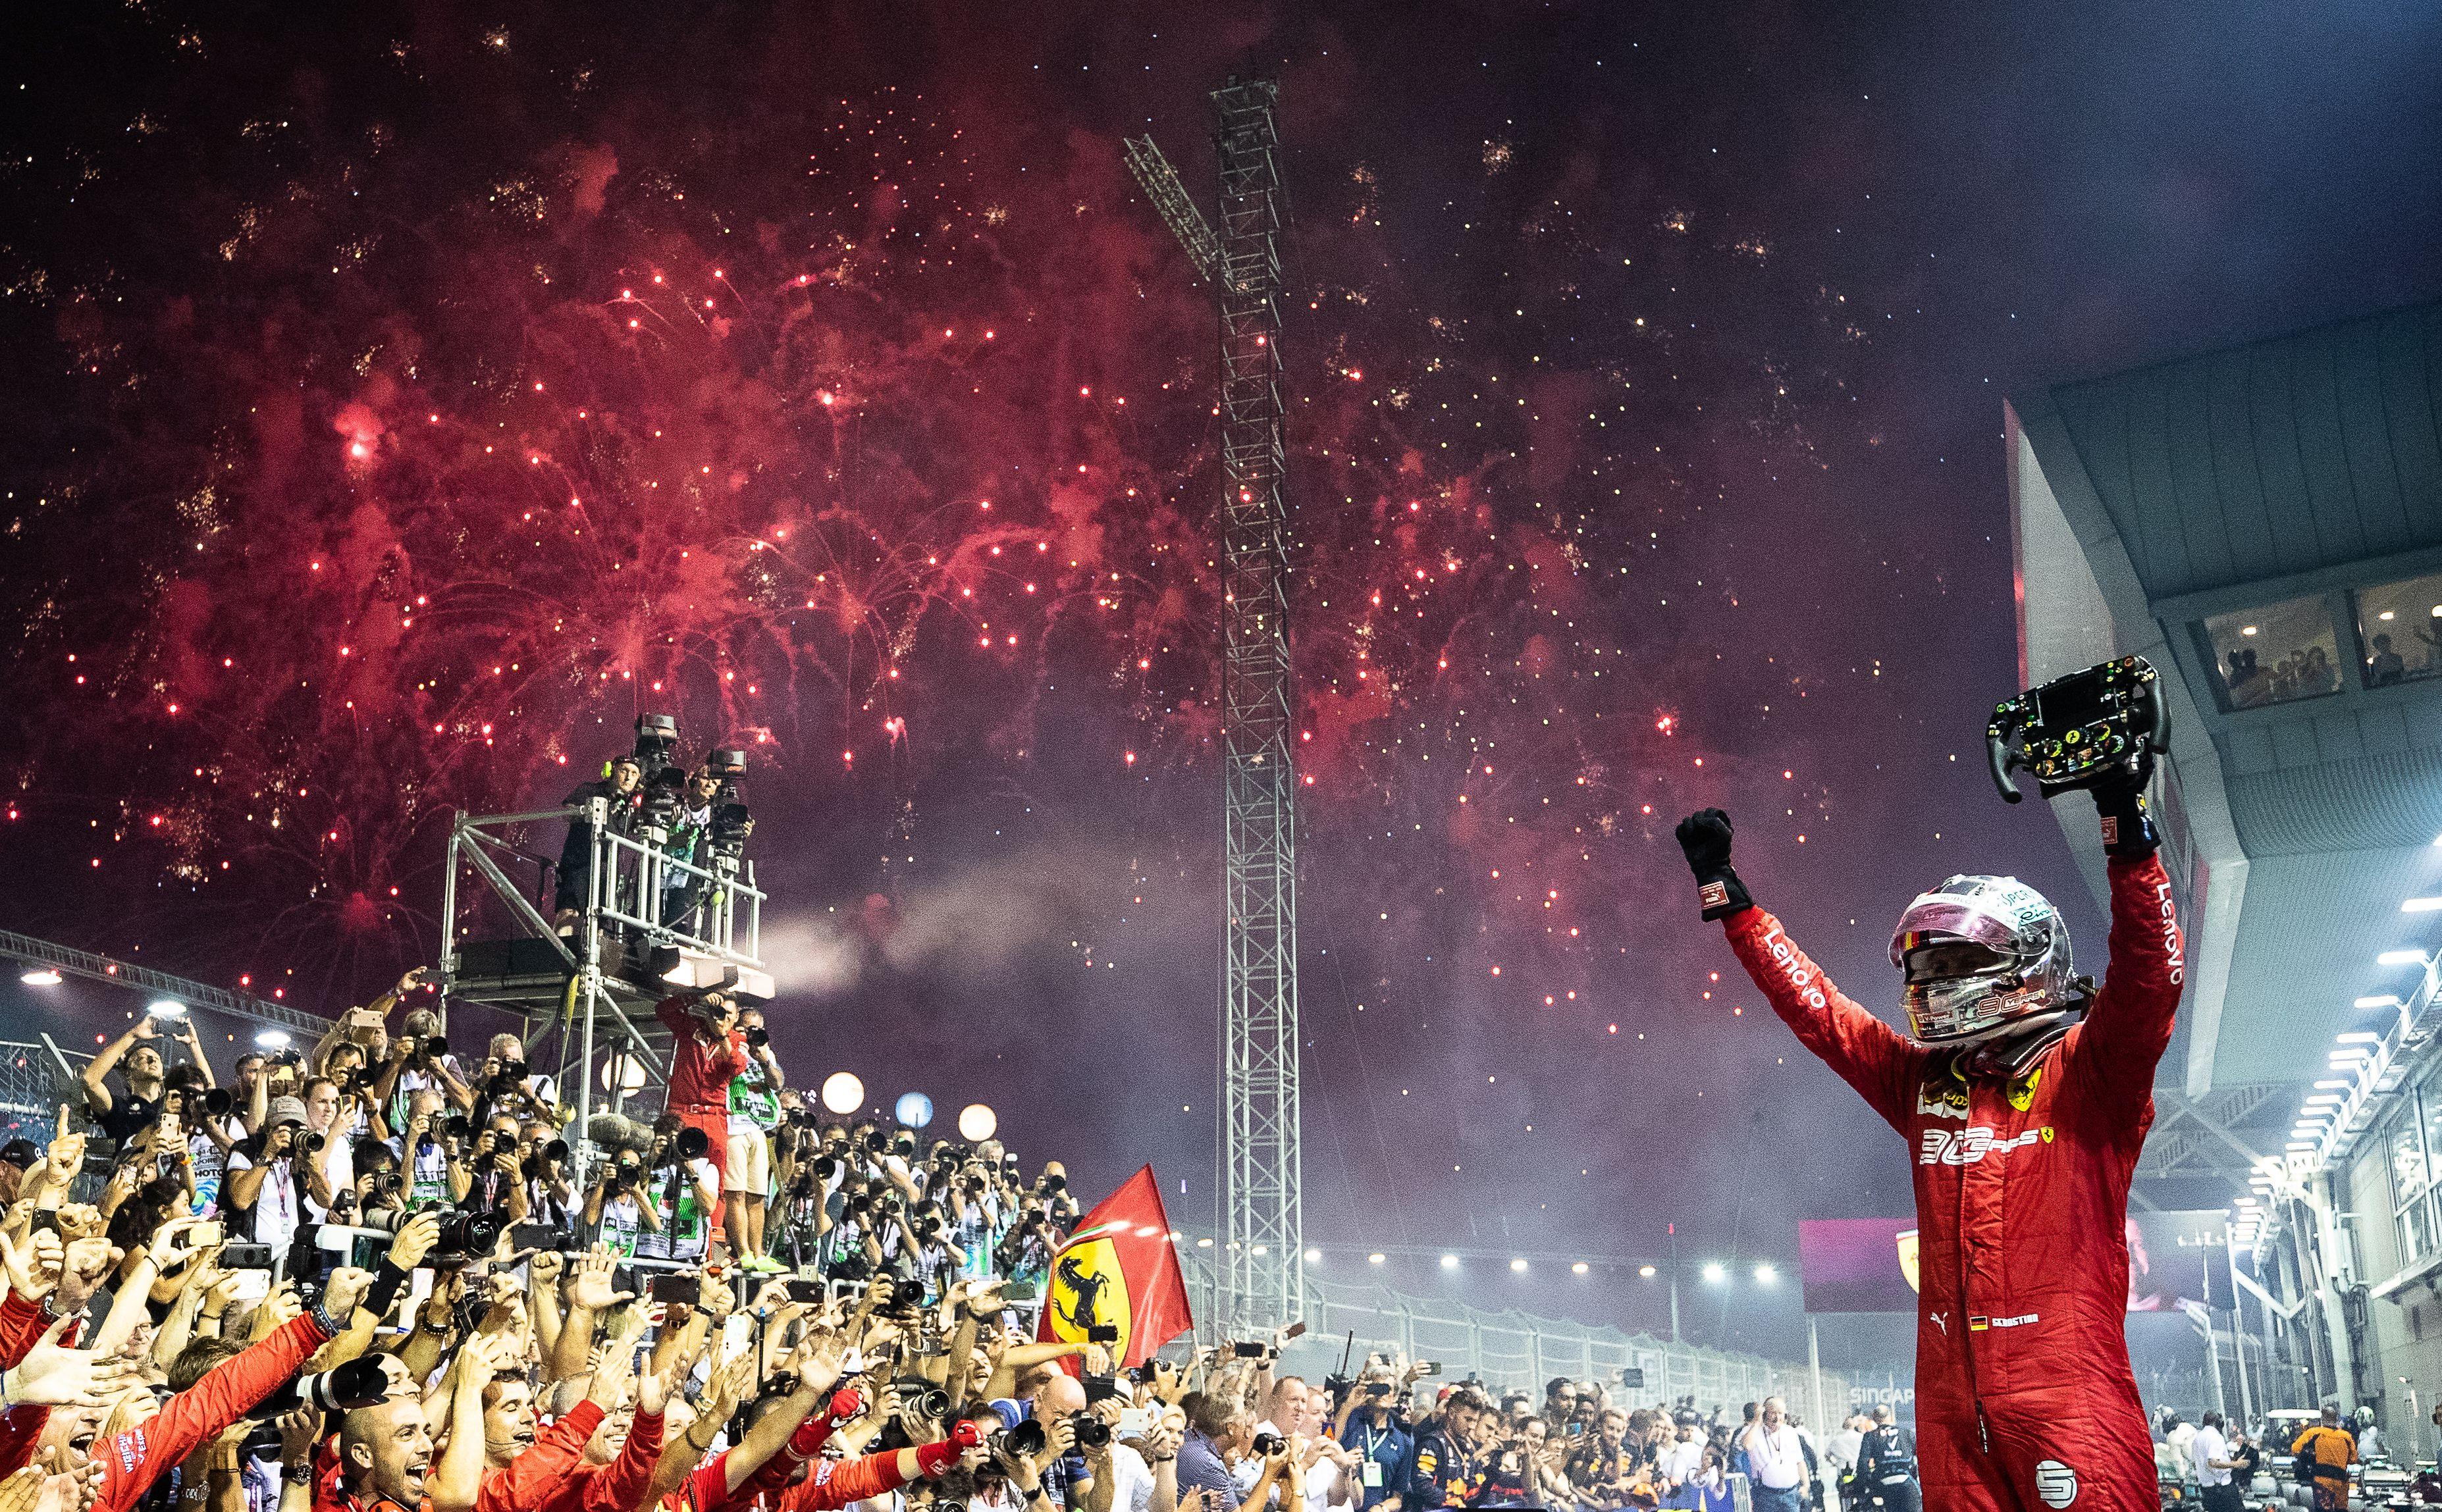 Sebastian Vettel after winning the Singapore Grand Prix